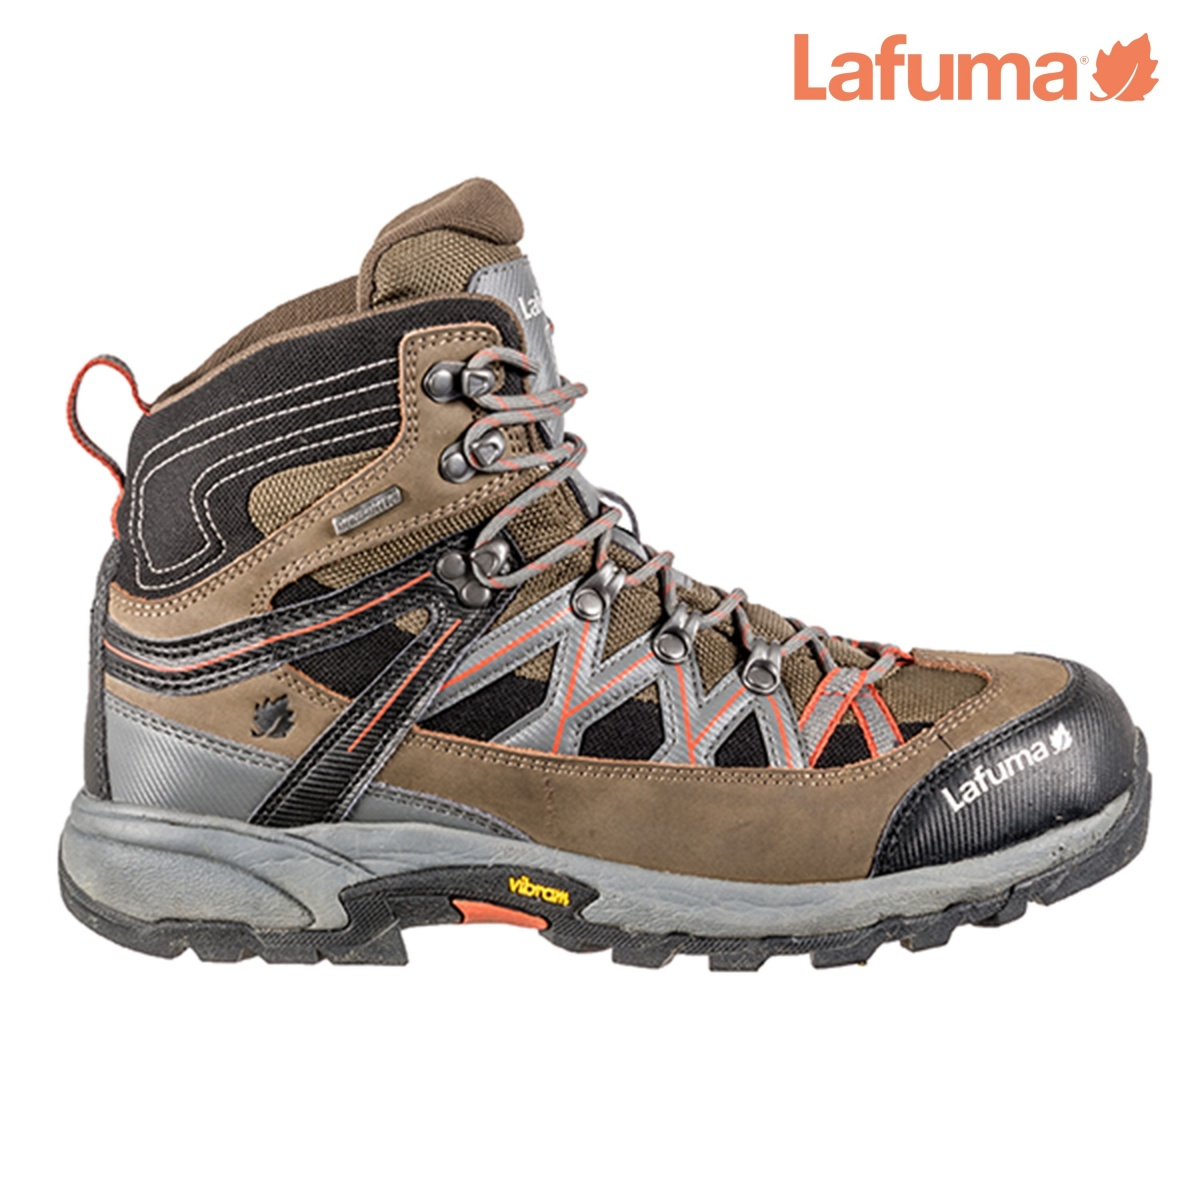 03fb5689a00 Pánské boty Lafuma – ATAKAMA II M. Atacama II M